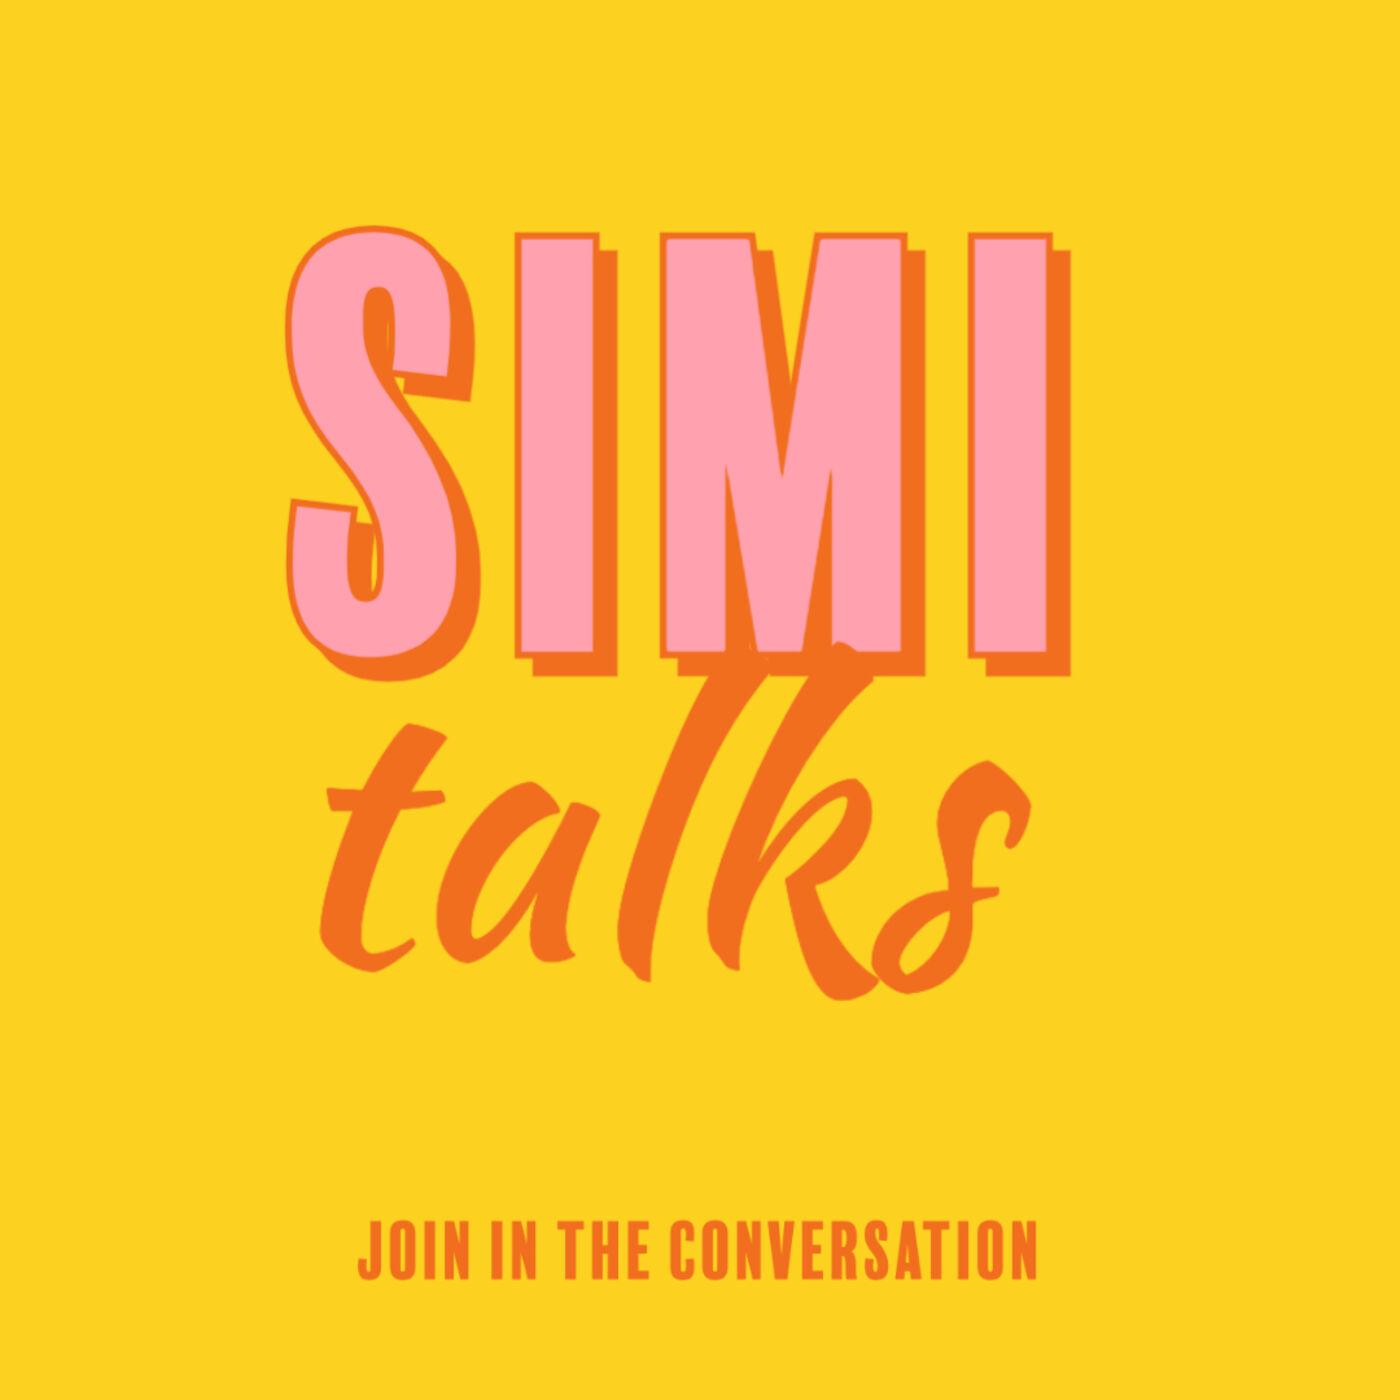 Simi Talks